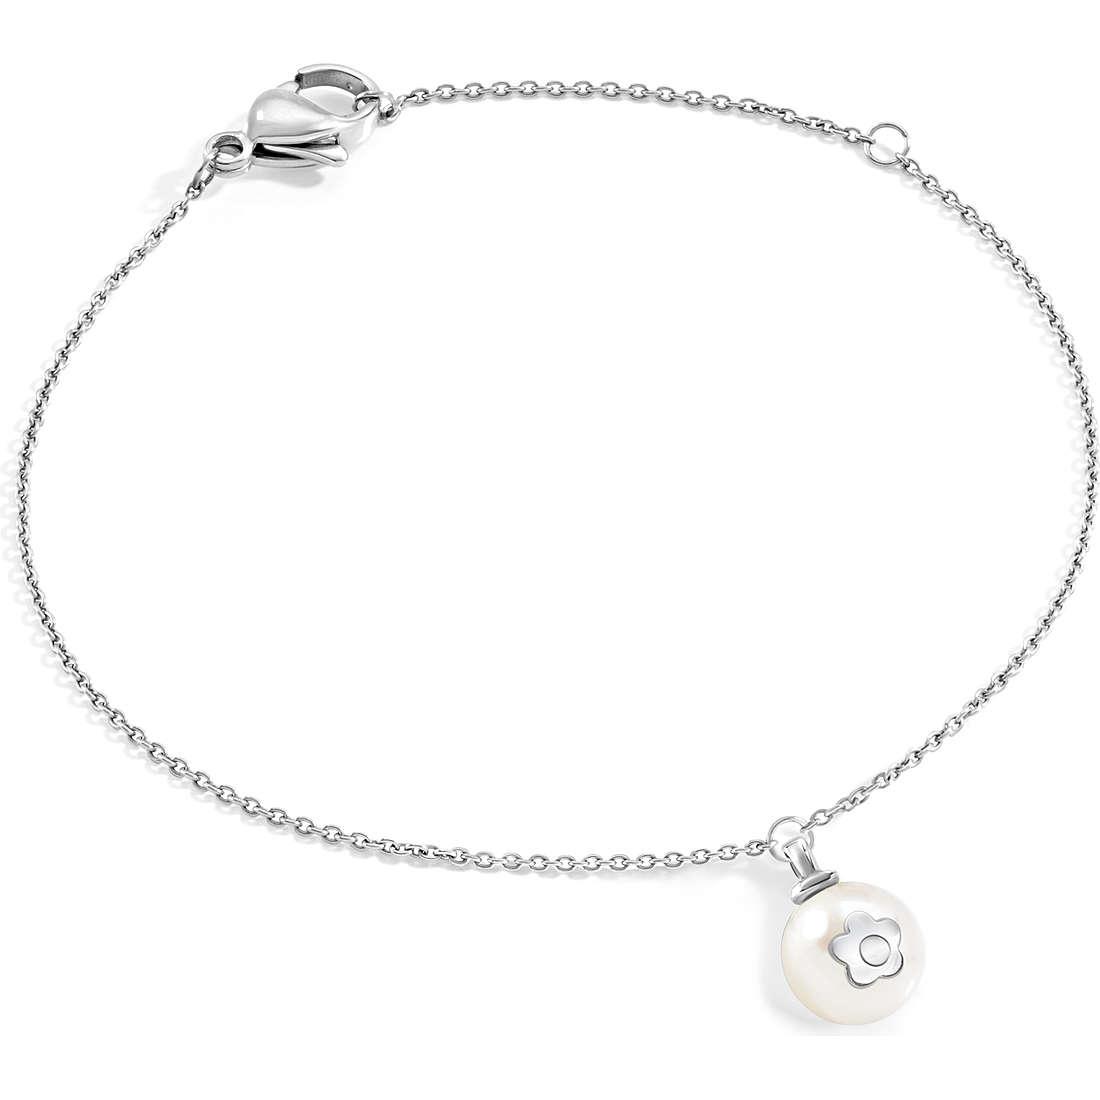 bracelet woman jewellery Morellato Le chicche SACQ08